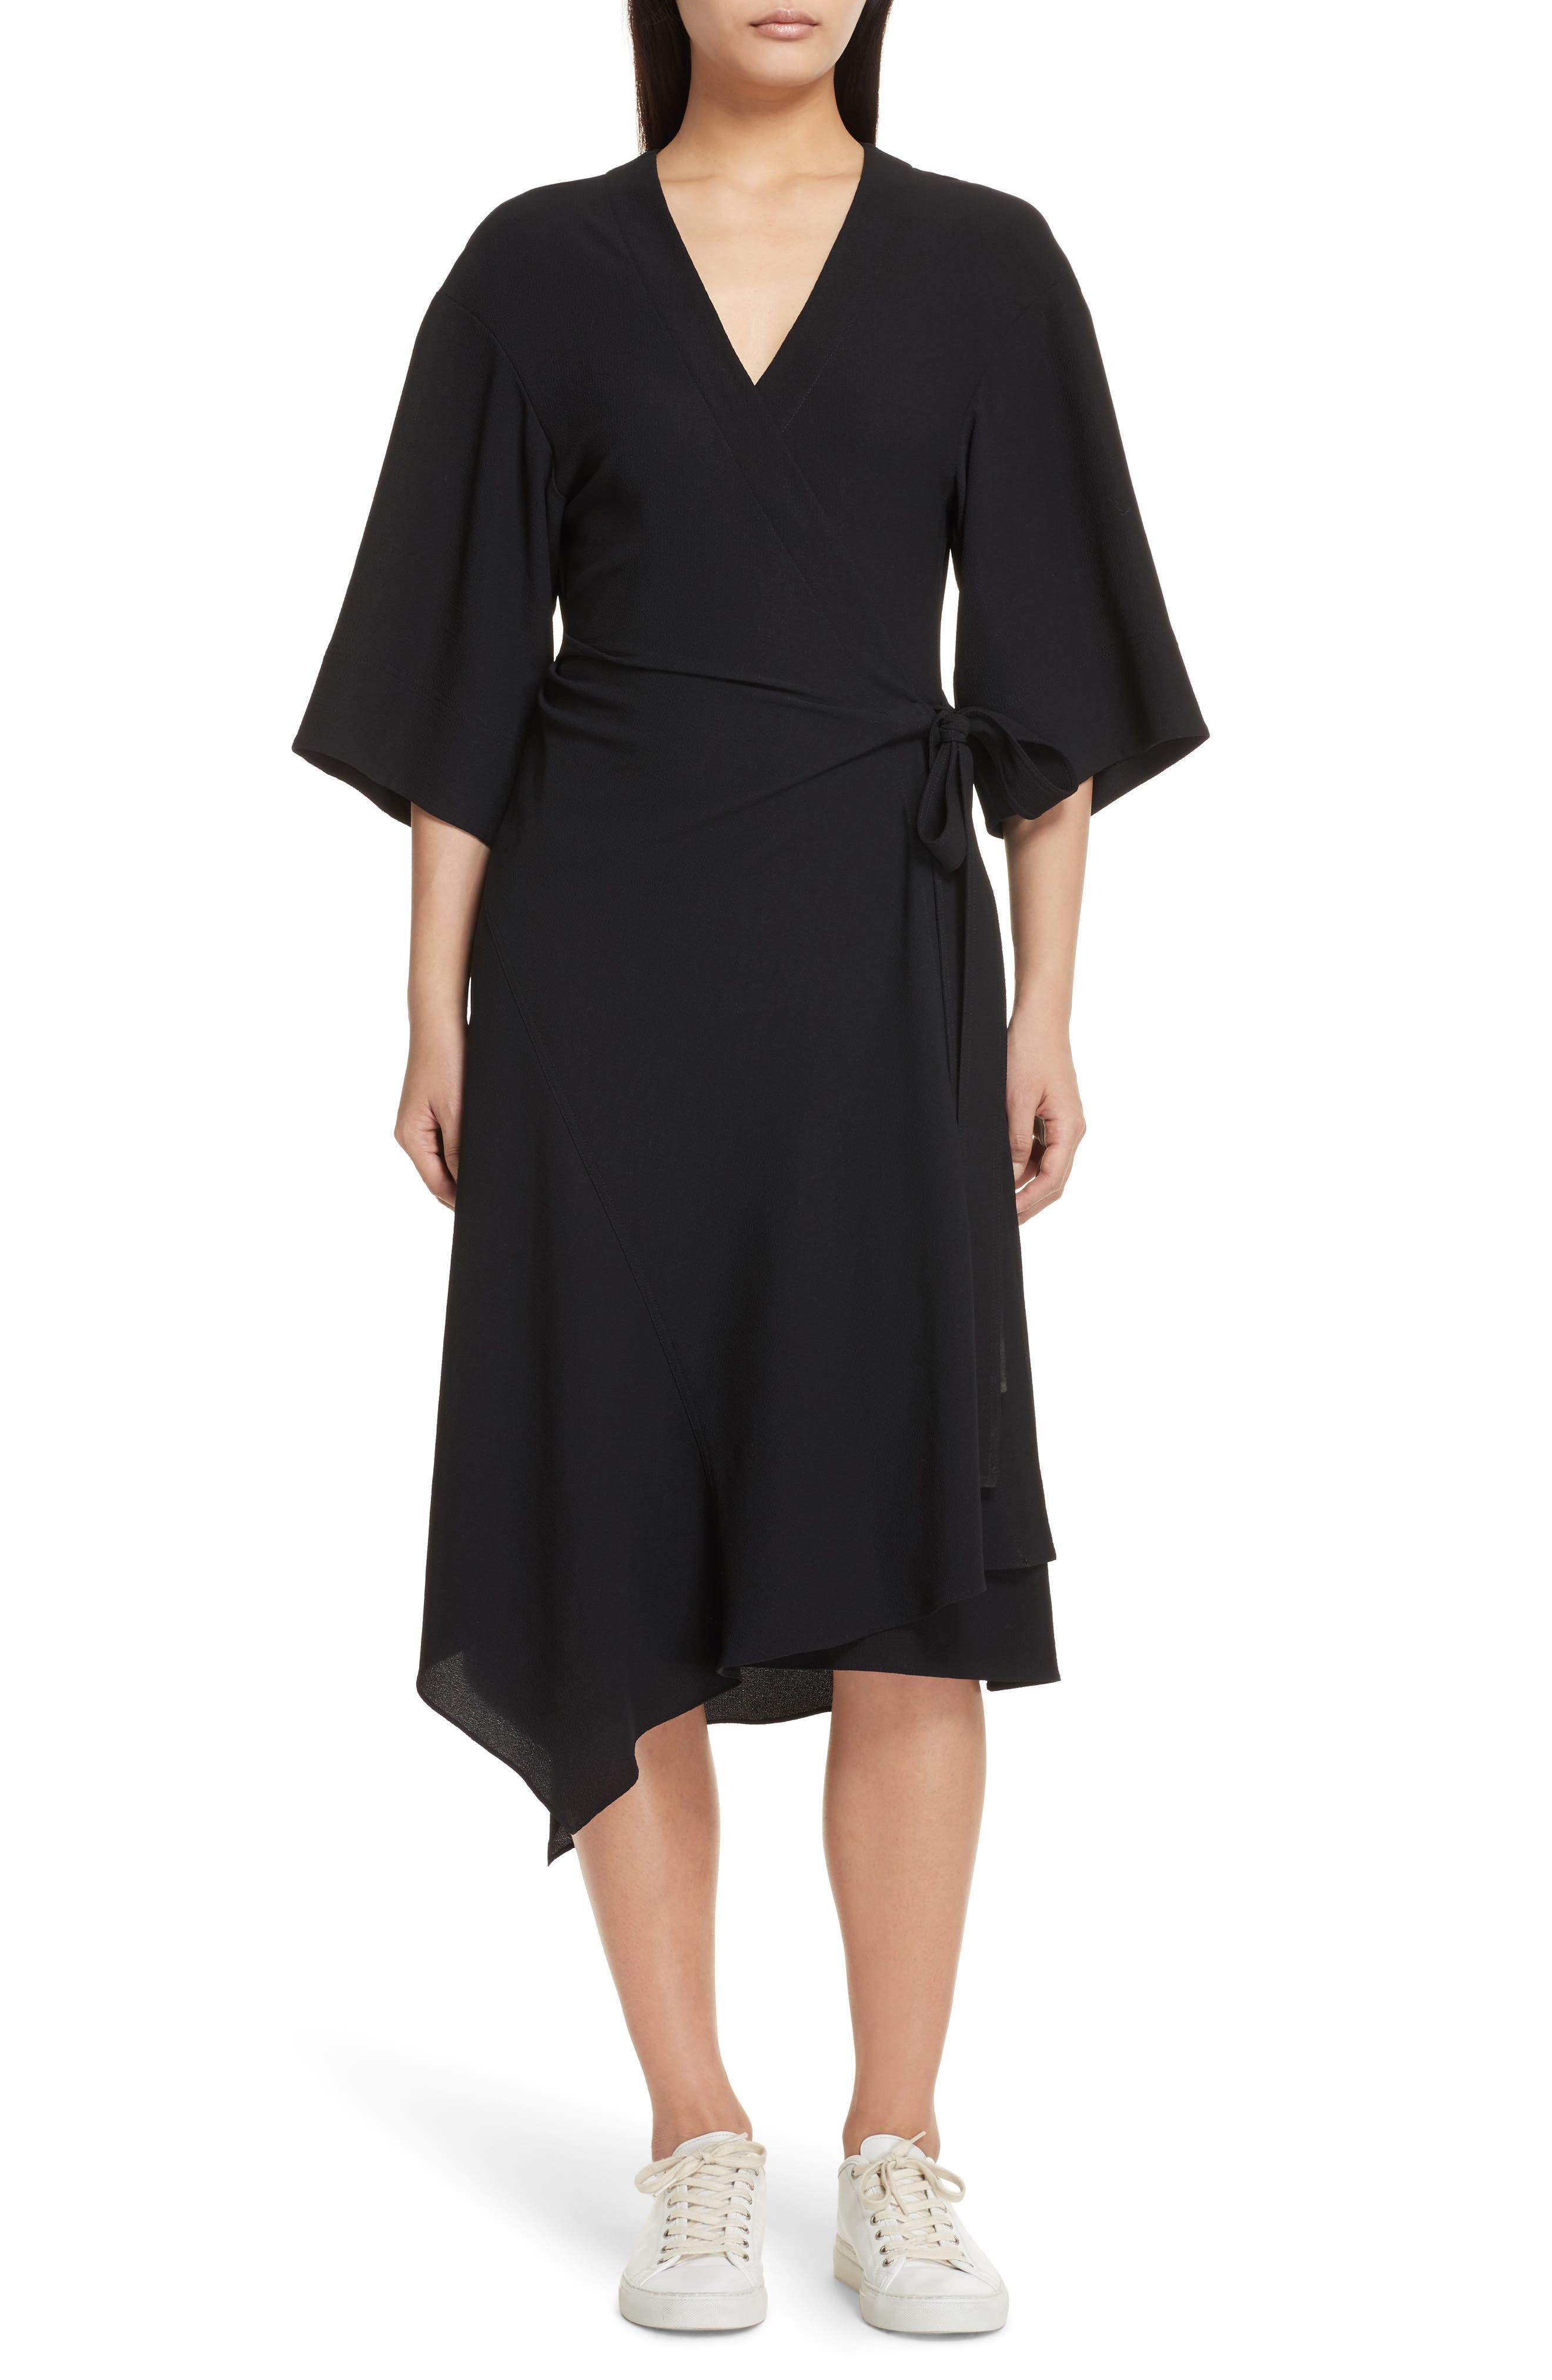 THEORY Kimono Crepe Wrap Dress, Main, color, 001